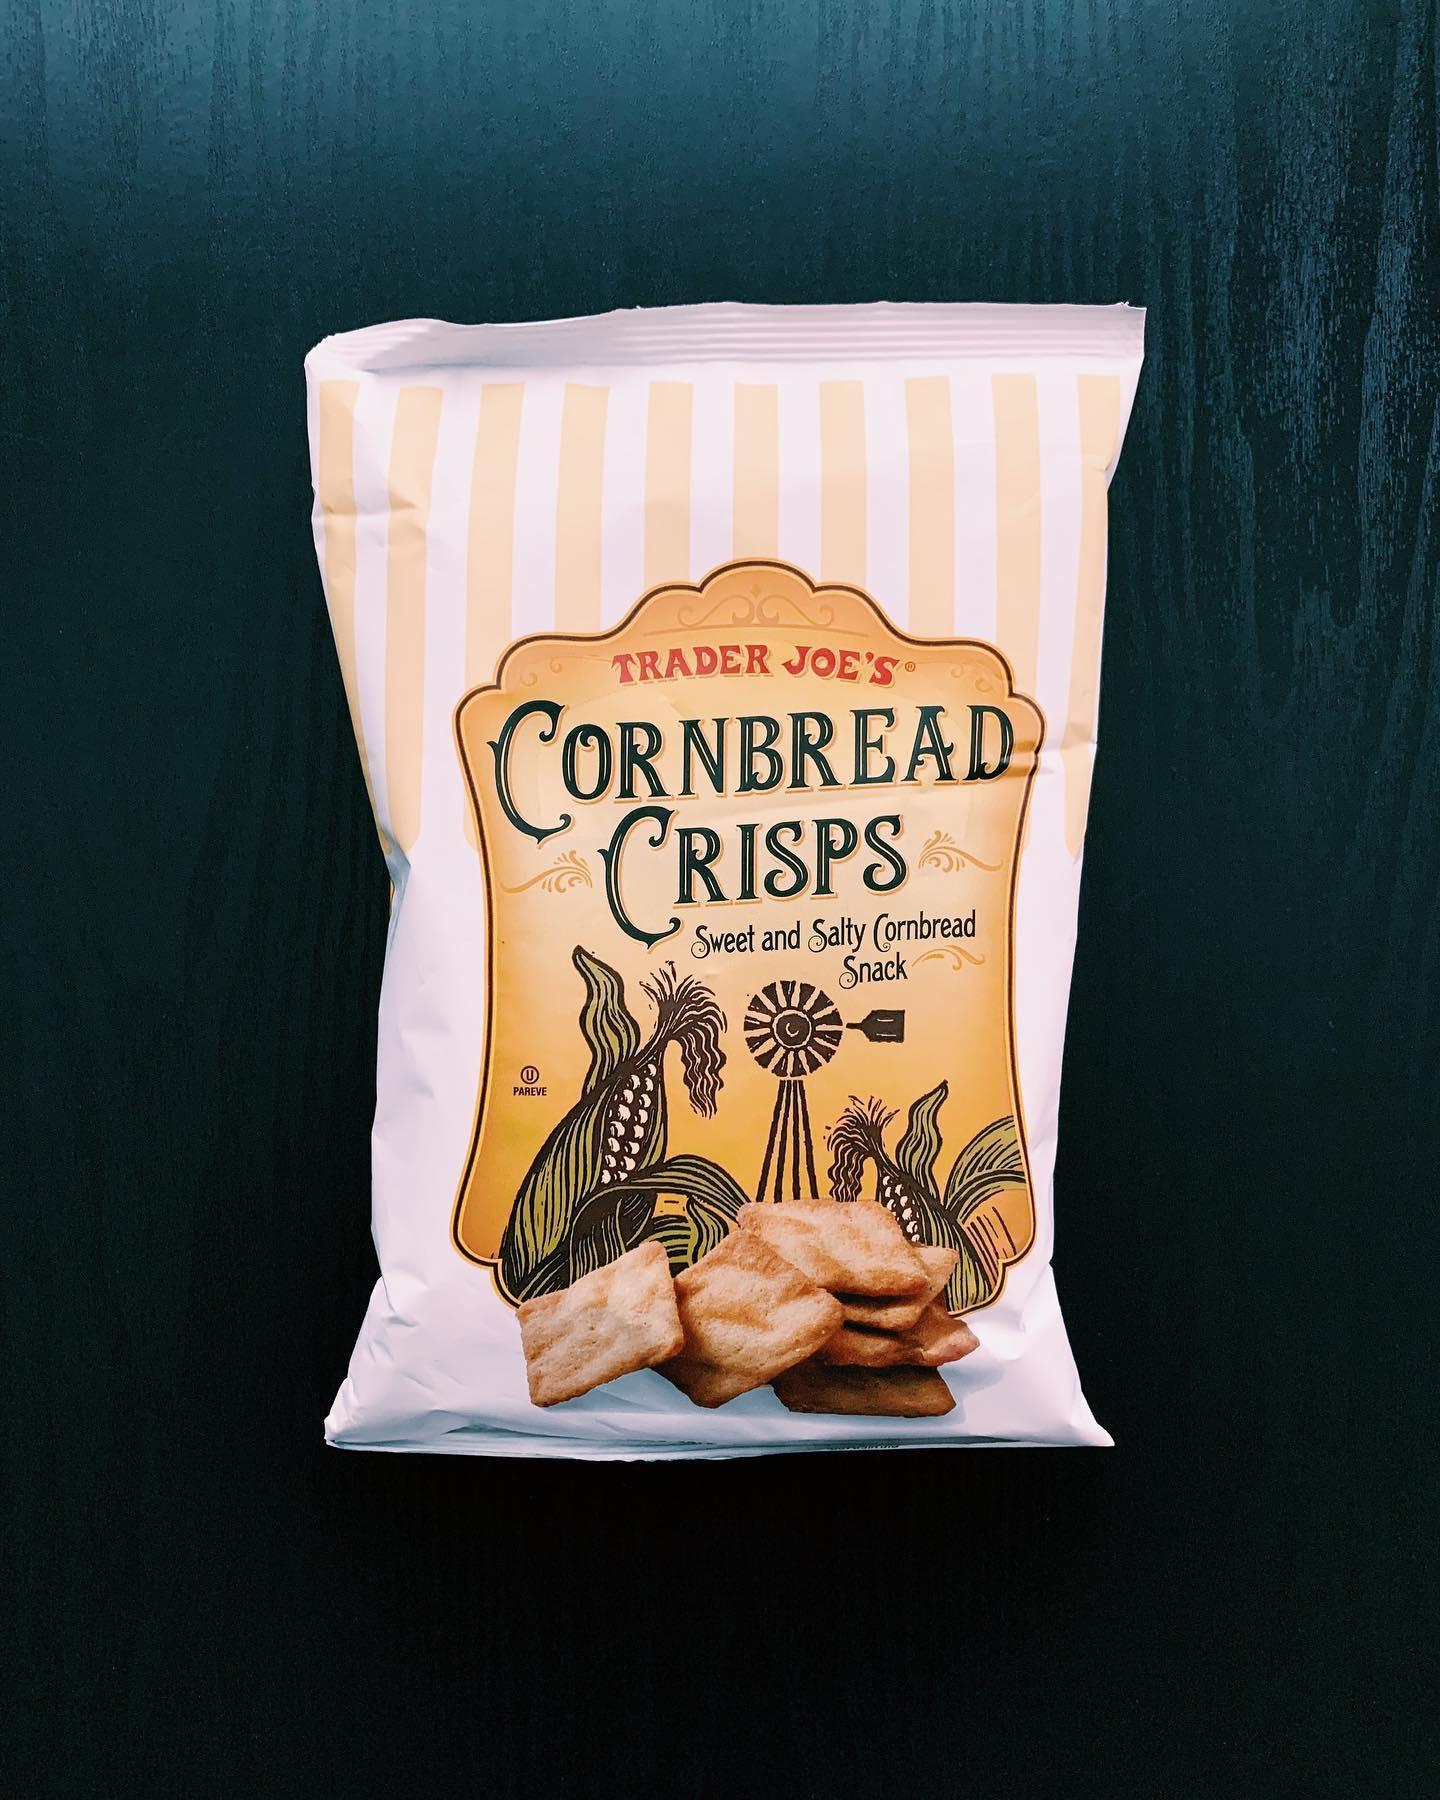 Cornbread Crisps: 8/10